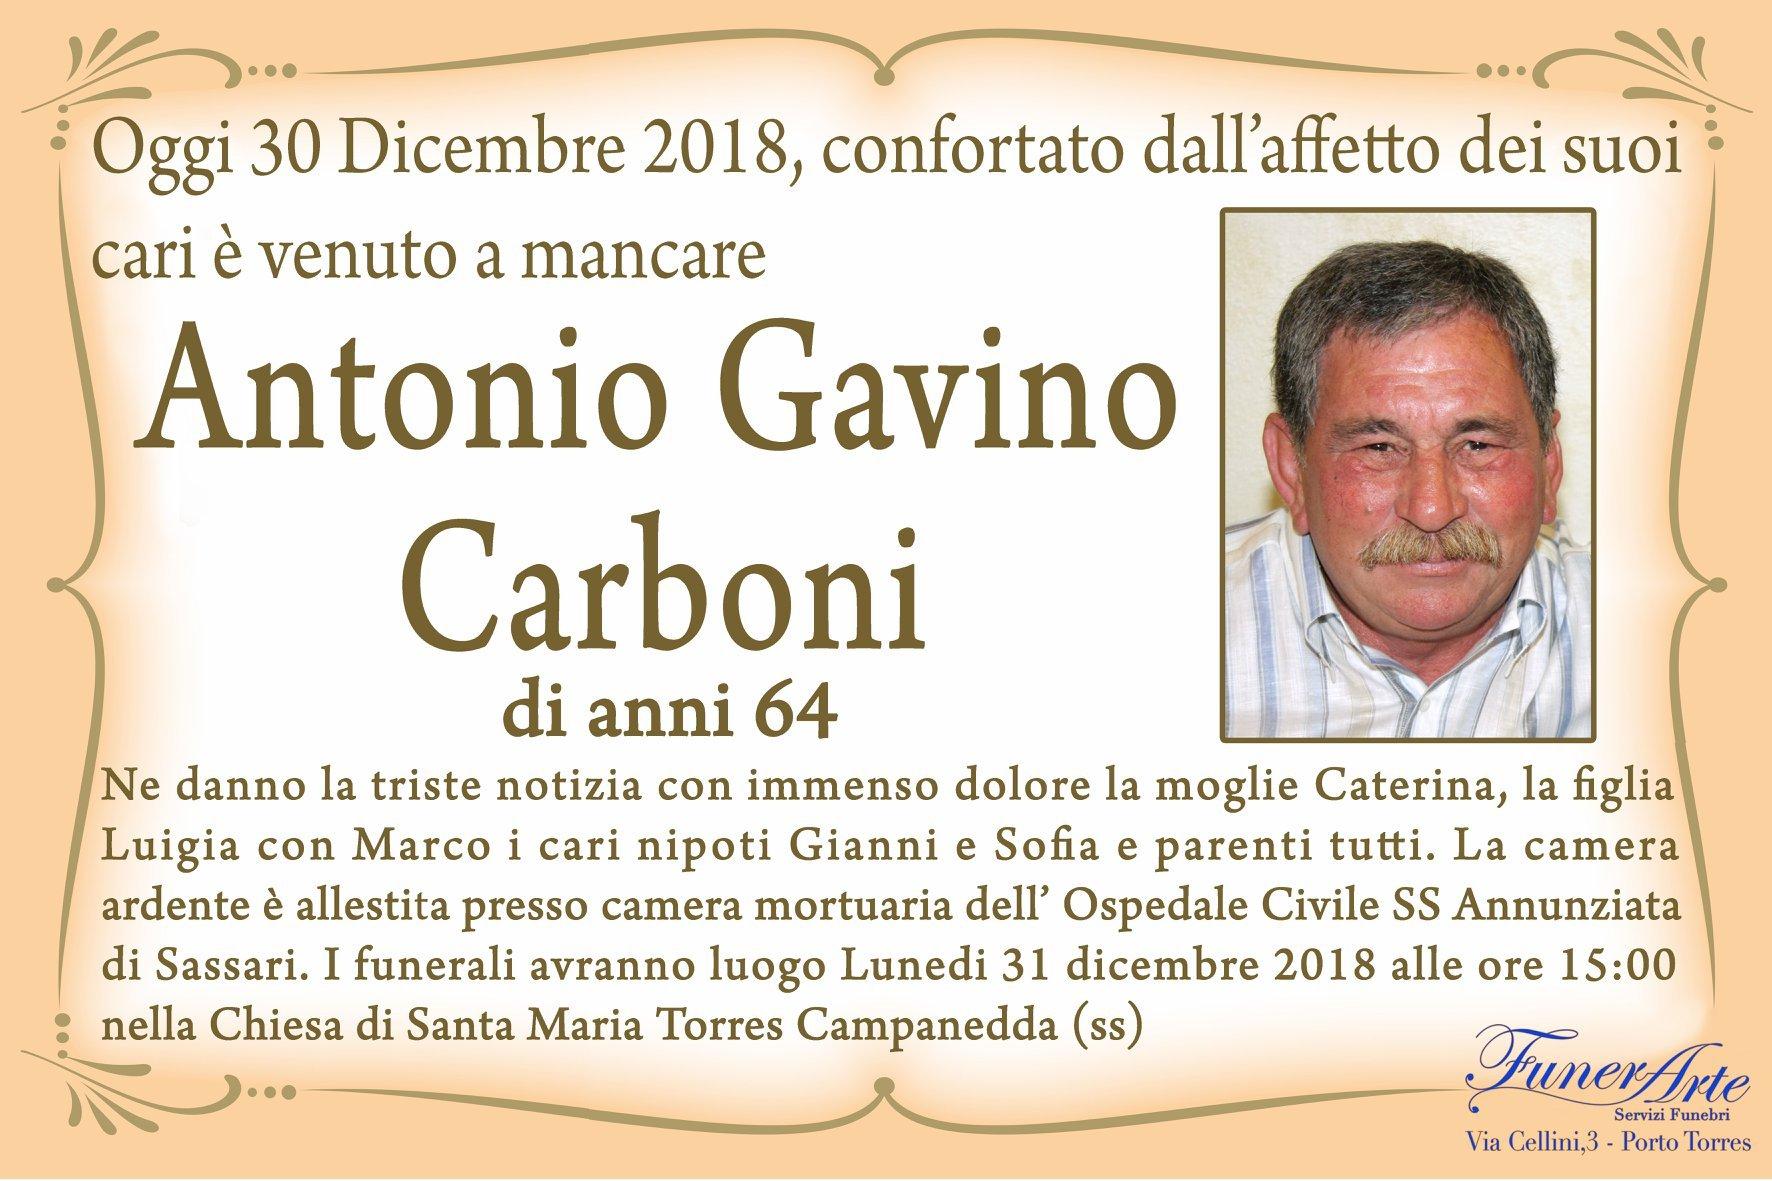 Antonio Gavino Carboni Necrologia